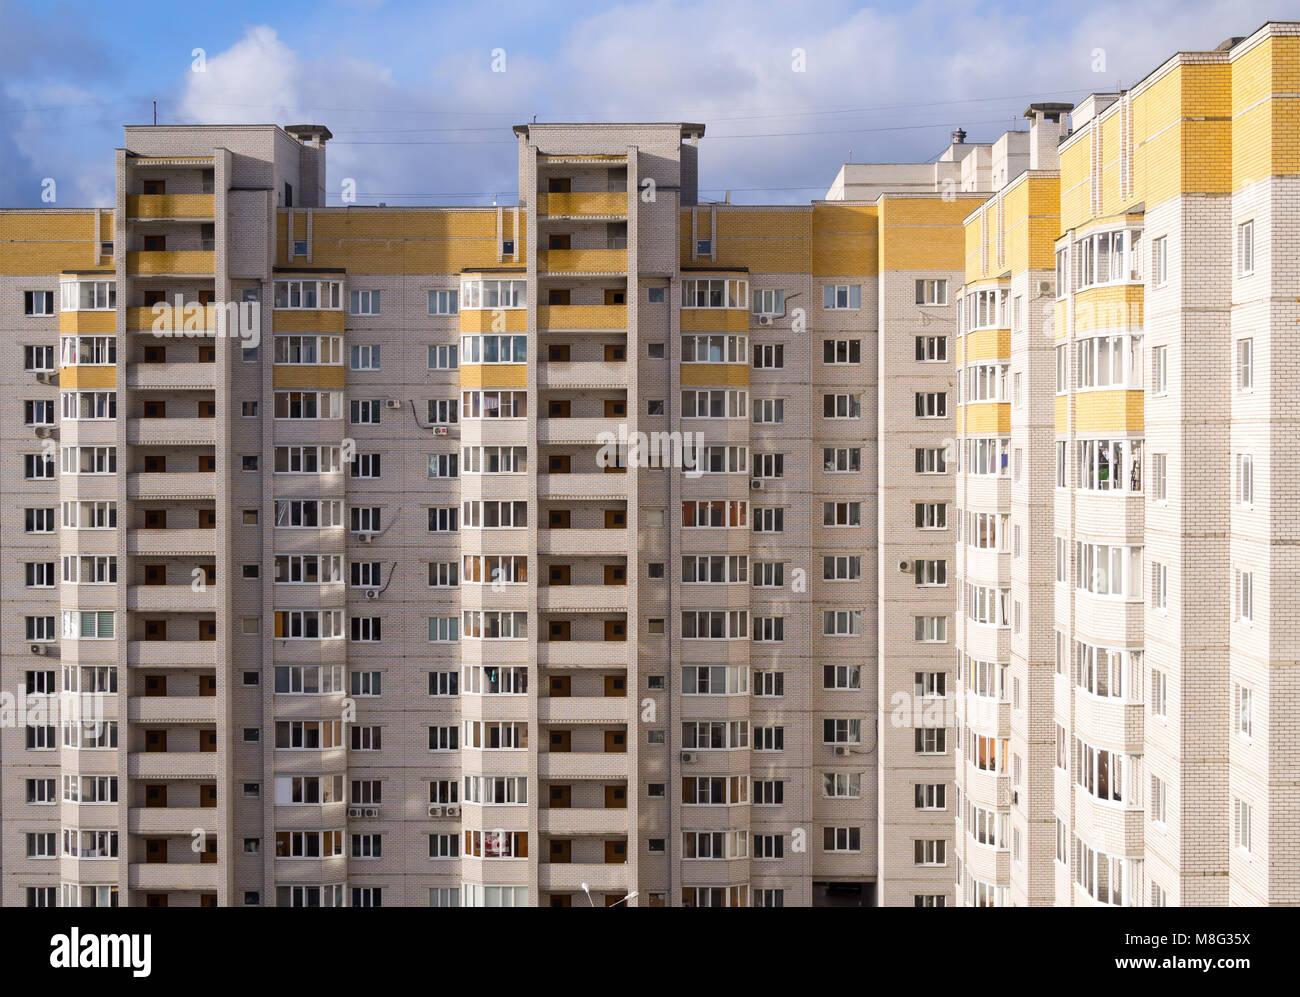 voronezh russia december 27 2015 new modern multistory brick house in city